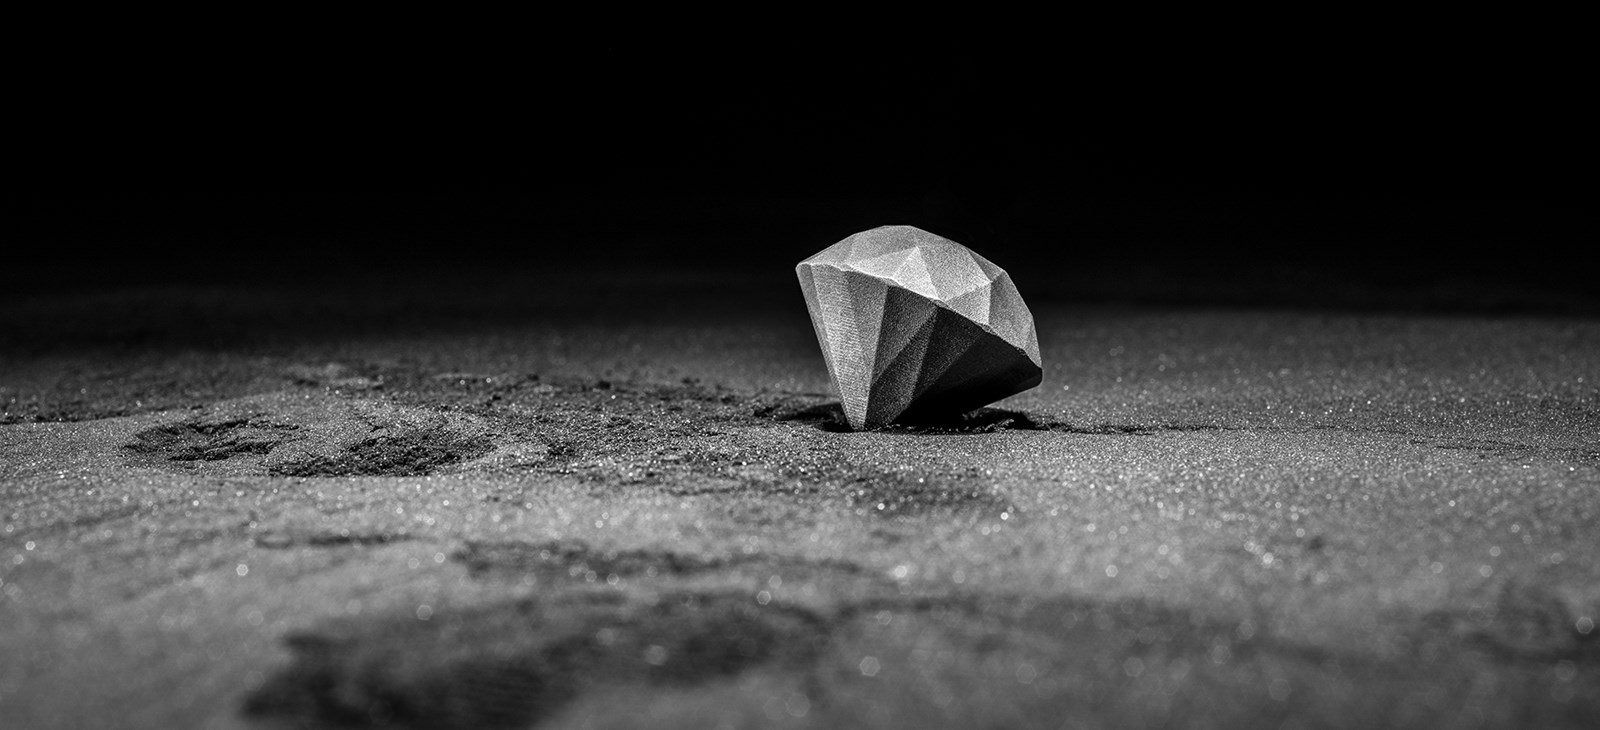 Sandvik Announces World's First 3D Printed Diamond Composite